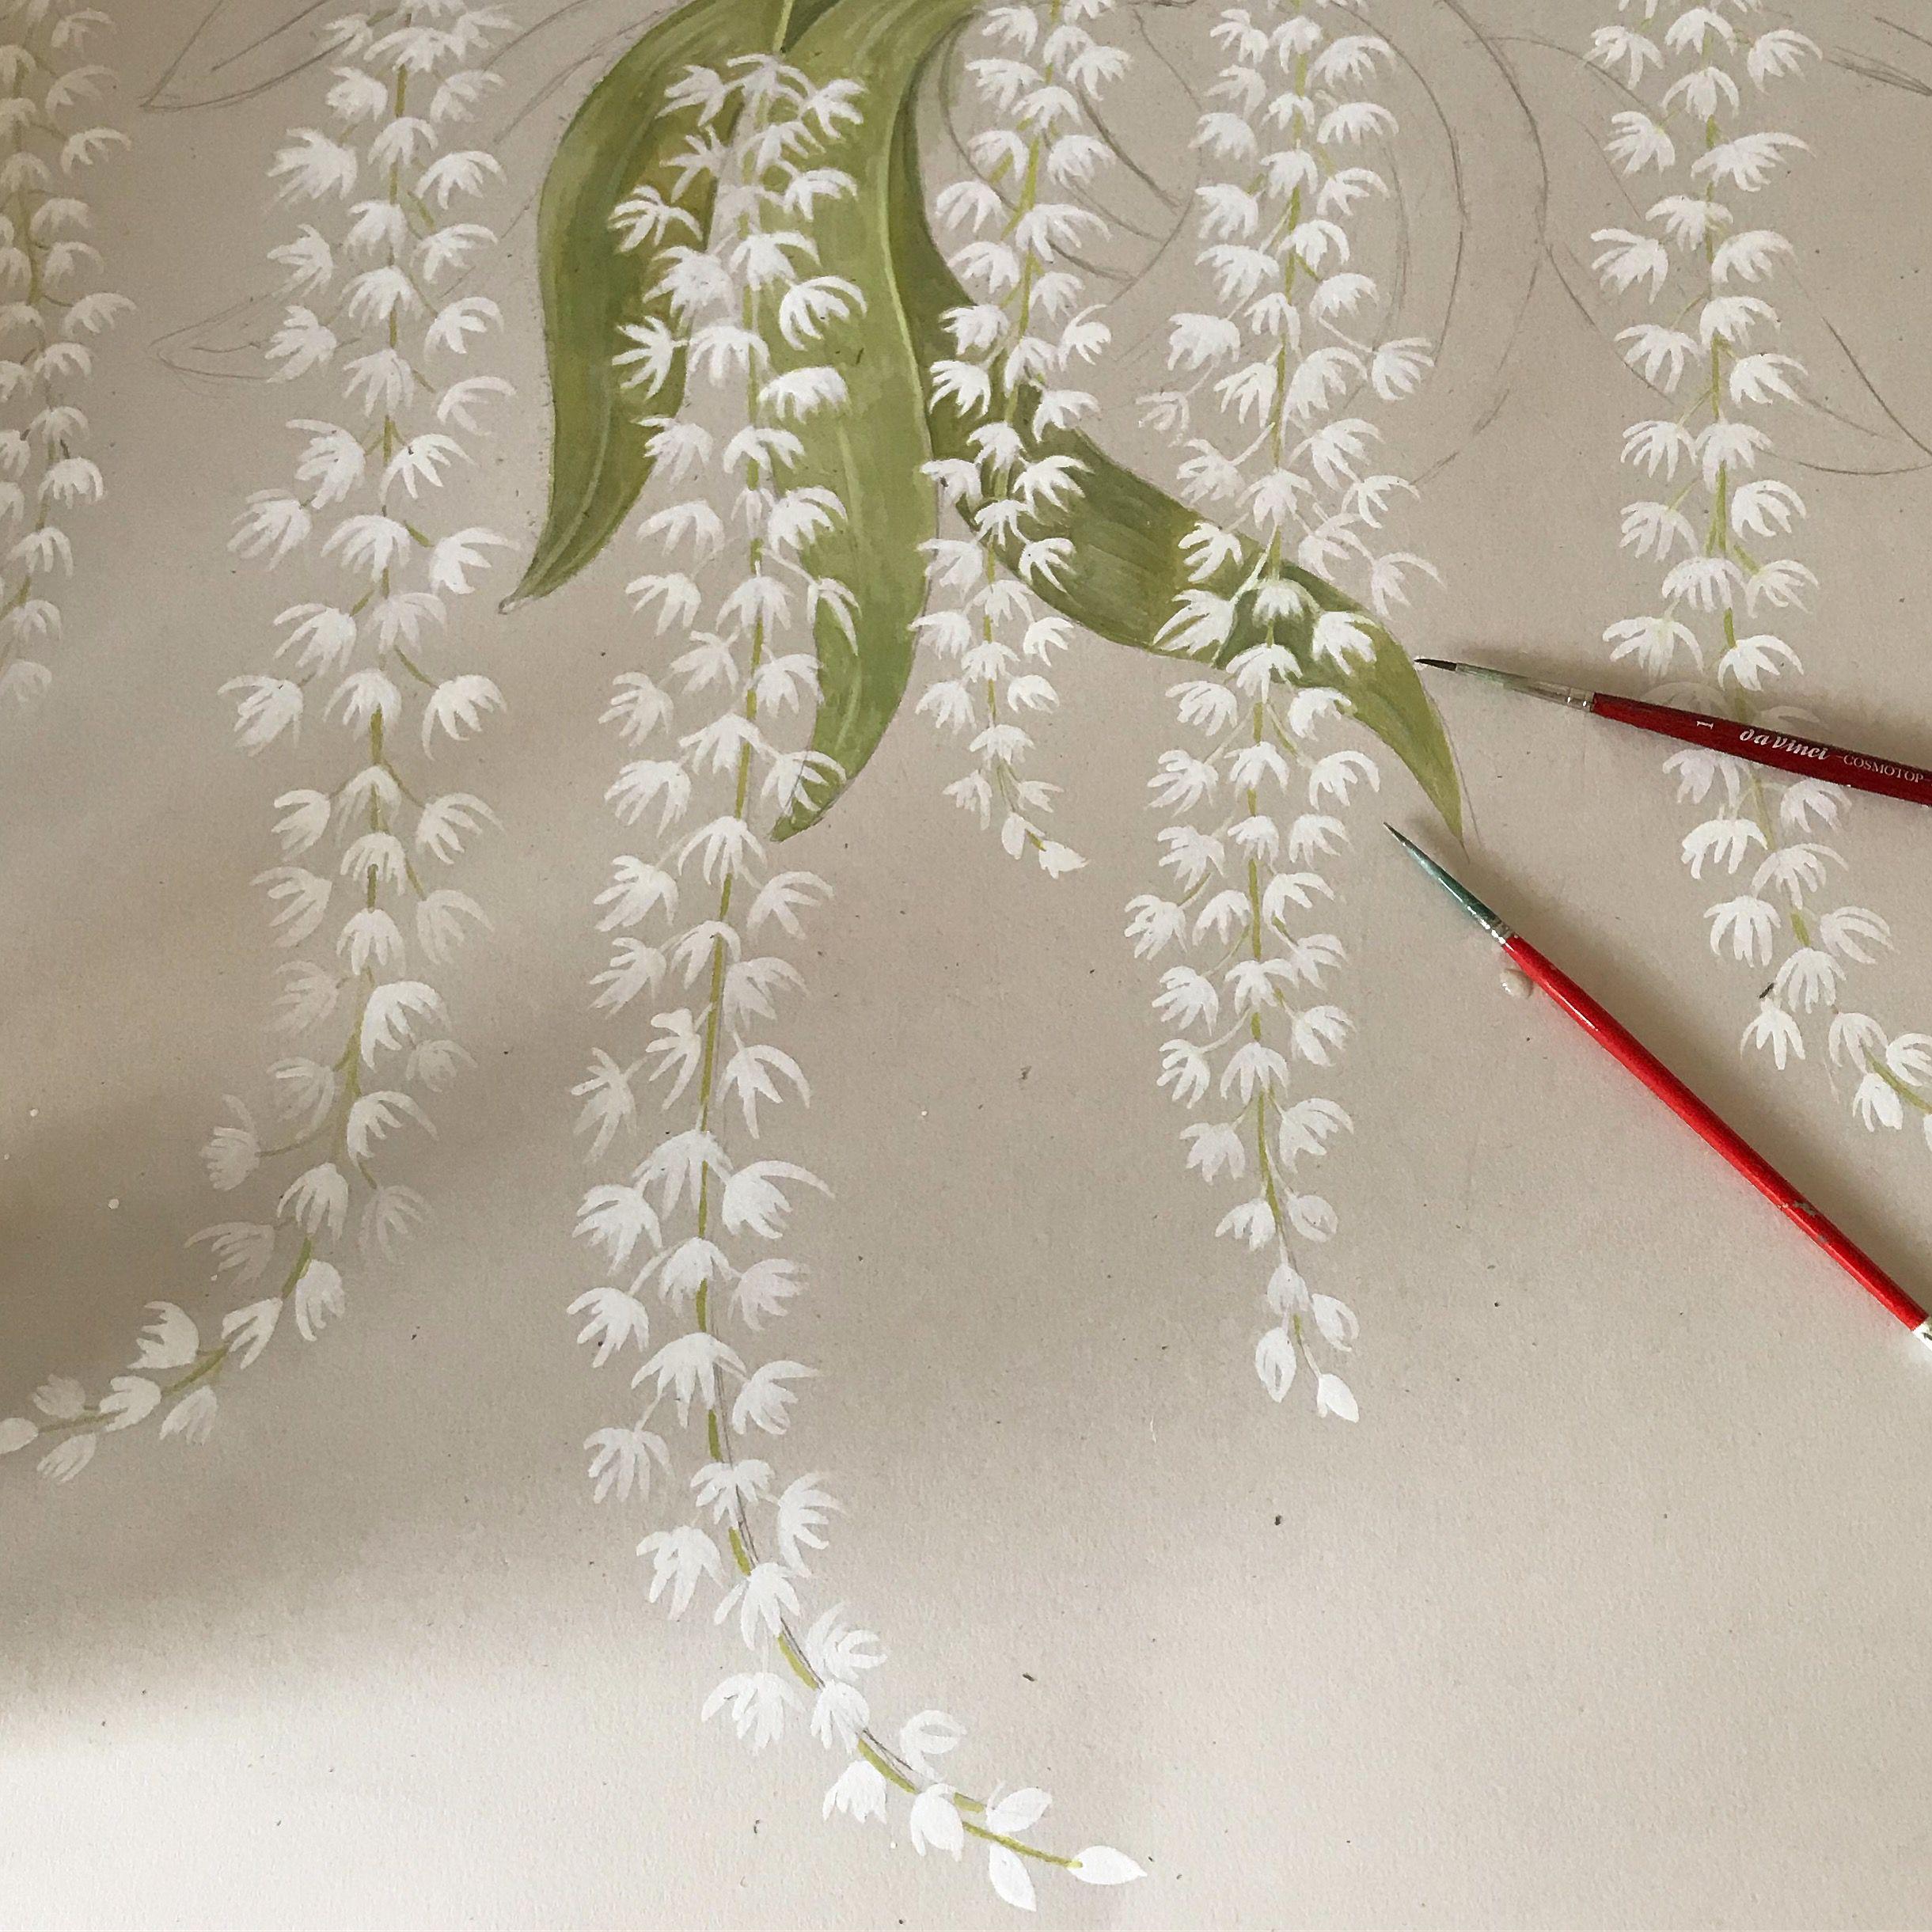 Bethany Linz • Wallpaper Artist • Orchid Wallpaper